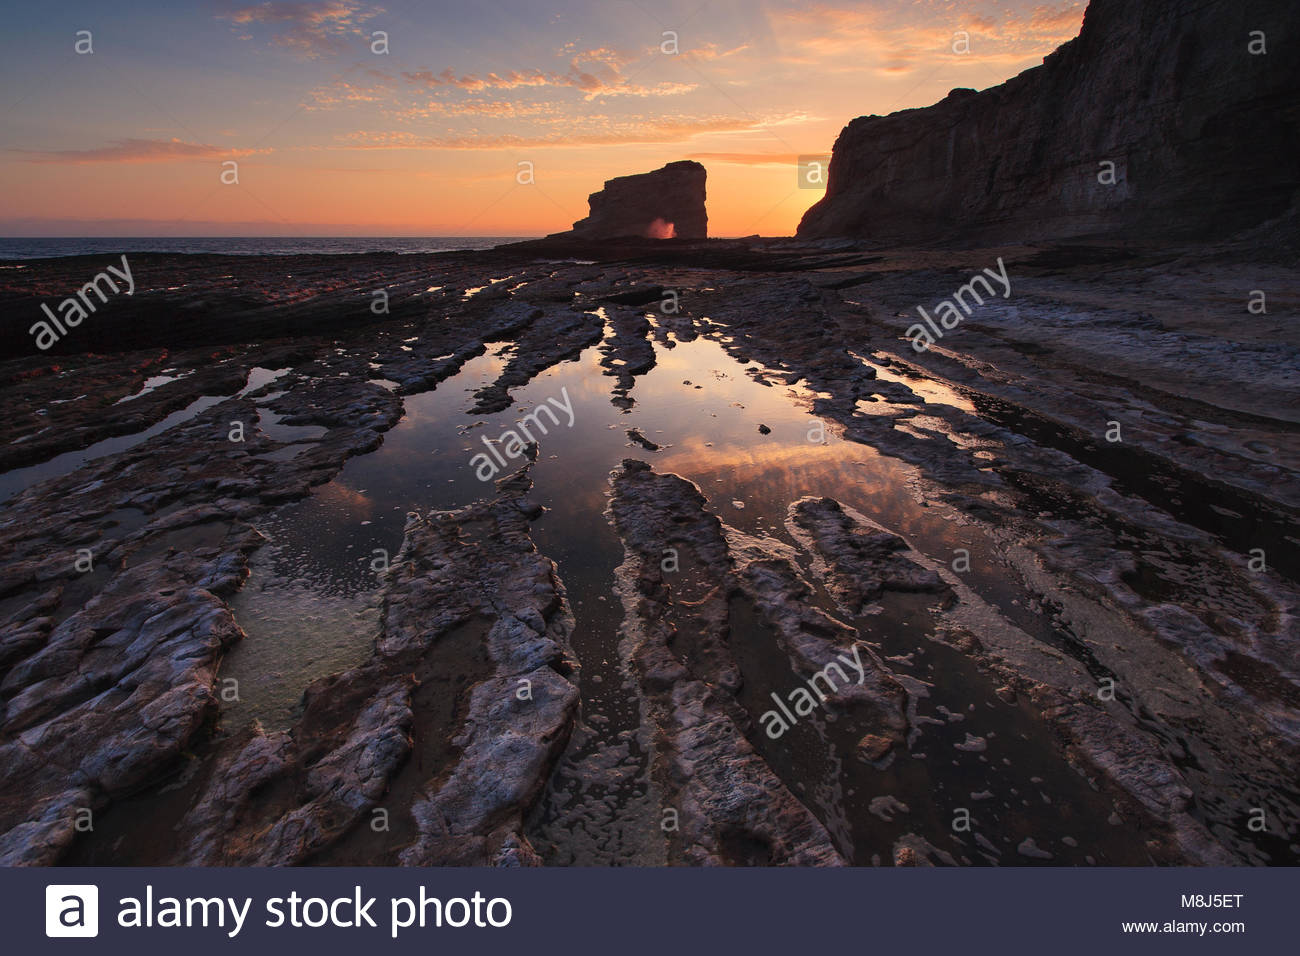 Panther Beach is a popular sandy beach north of Santa Cruz near the hamlet of Davenport, CA. It's part of the Coast - Stock Image